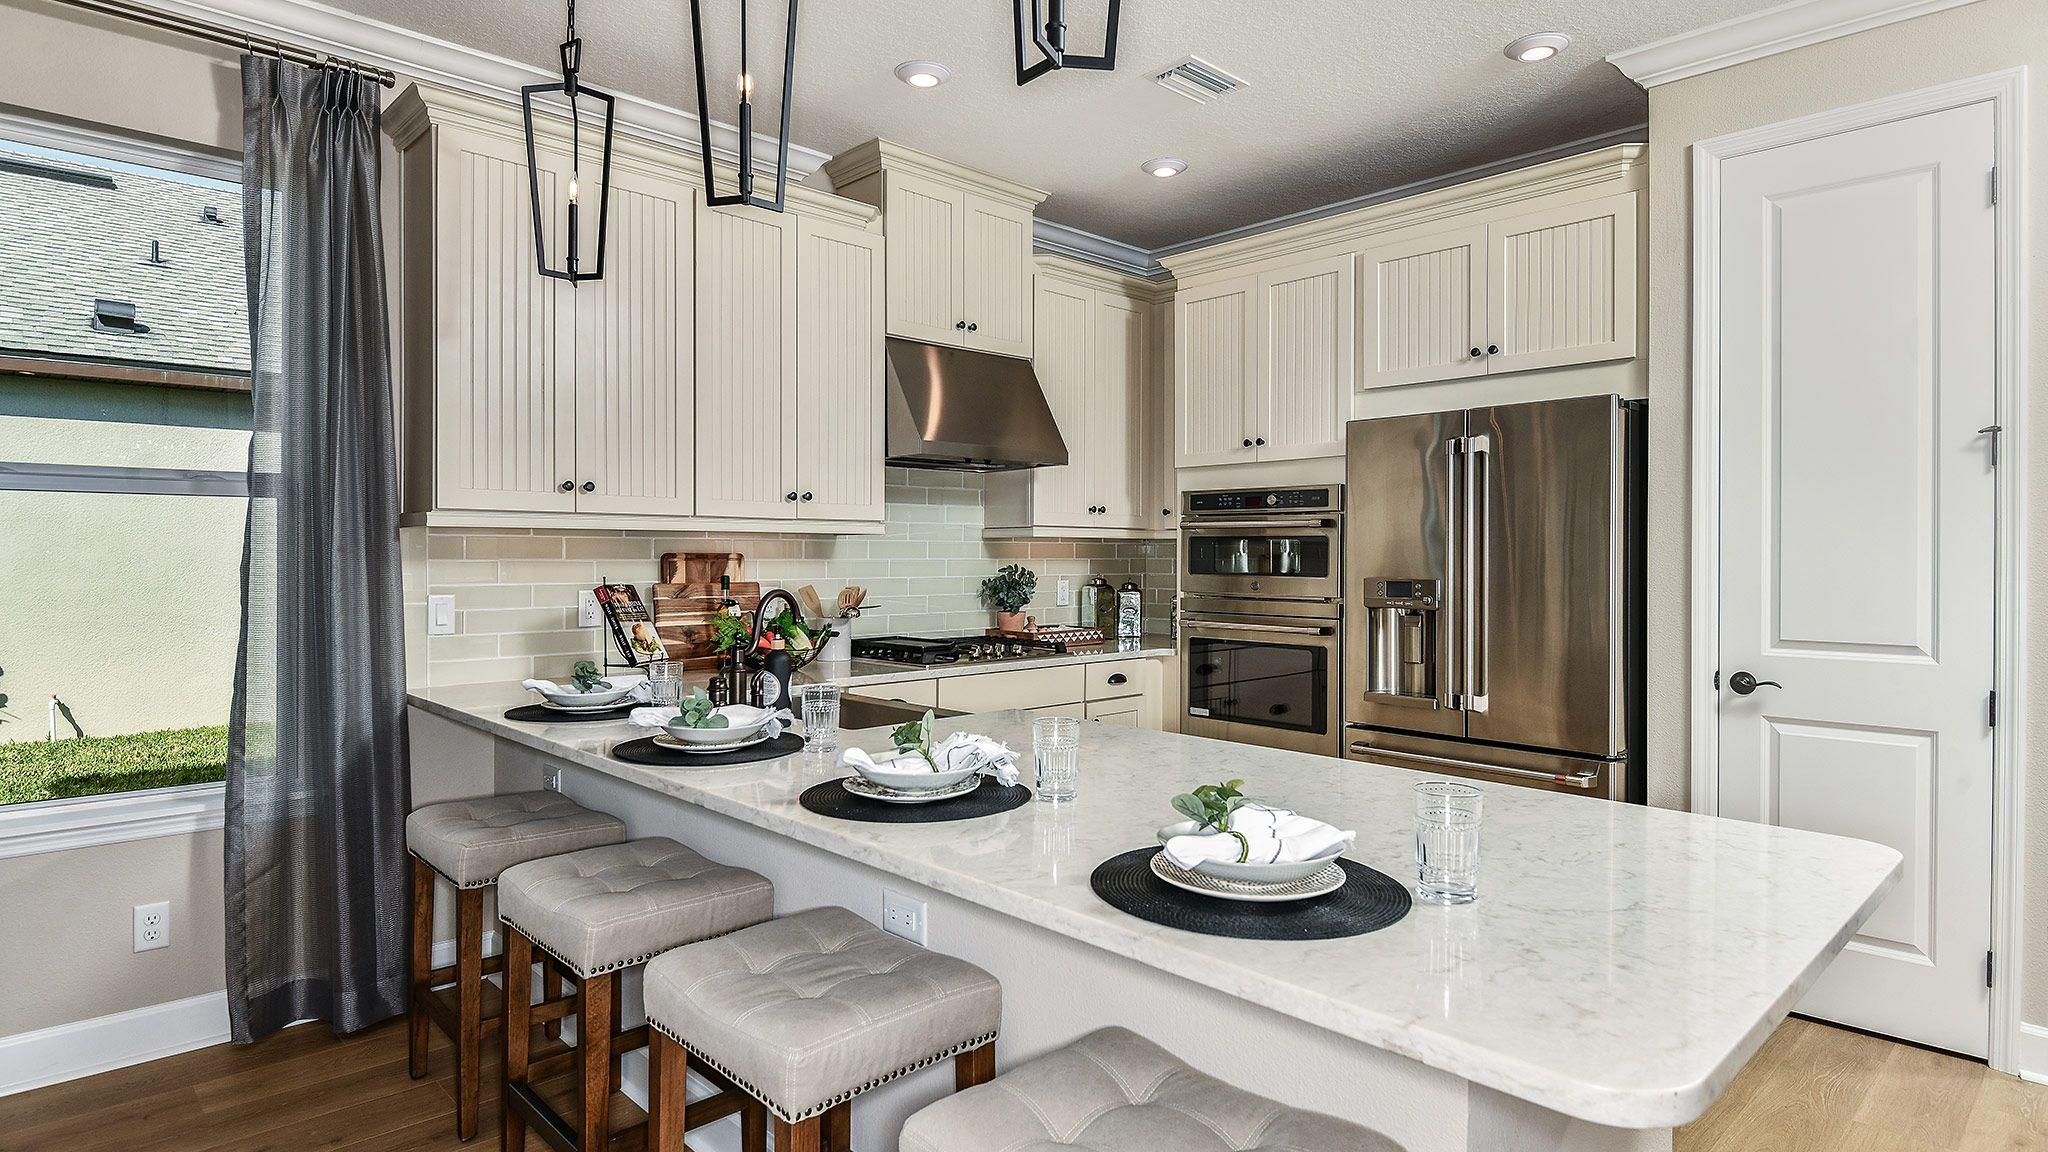 Kitchen featured in the Boca Grande By Taylor Morrison in Sarasota-Bradenton, FL